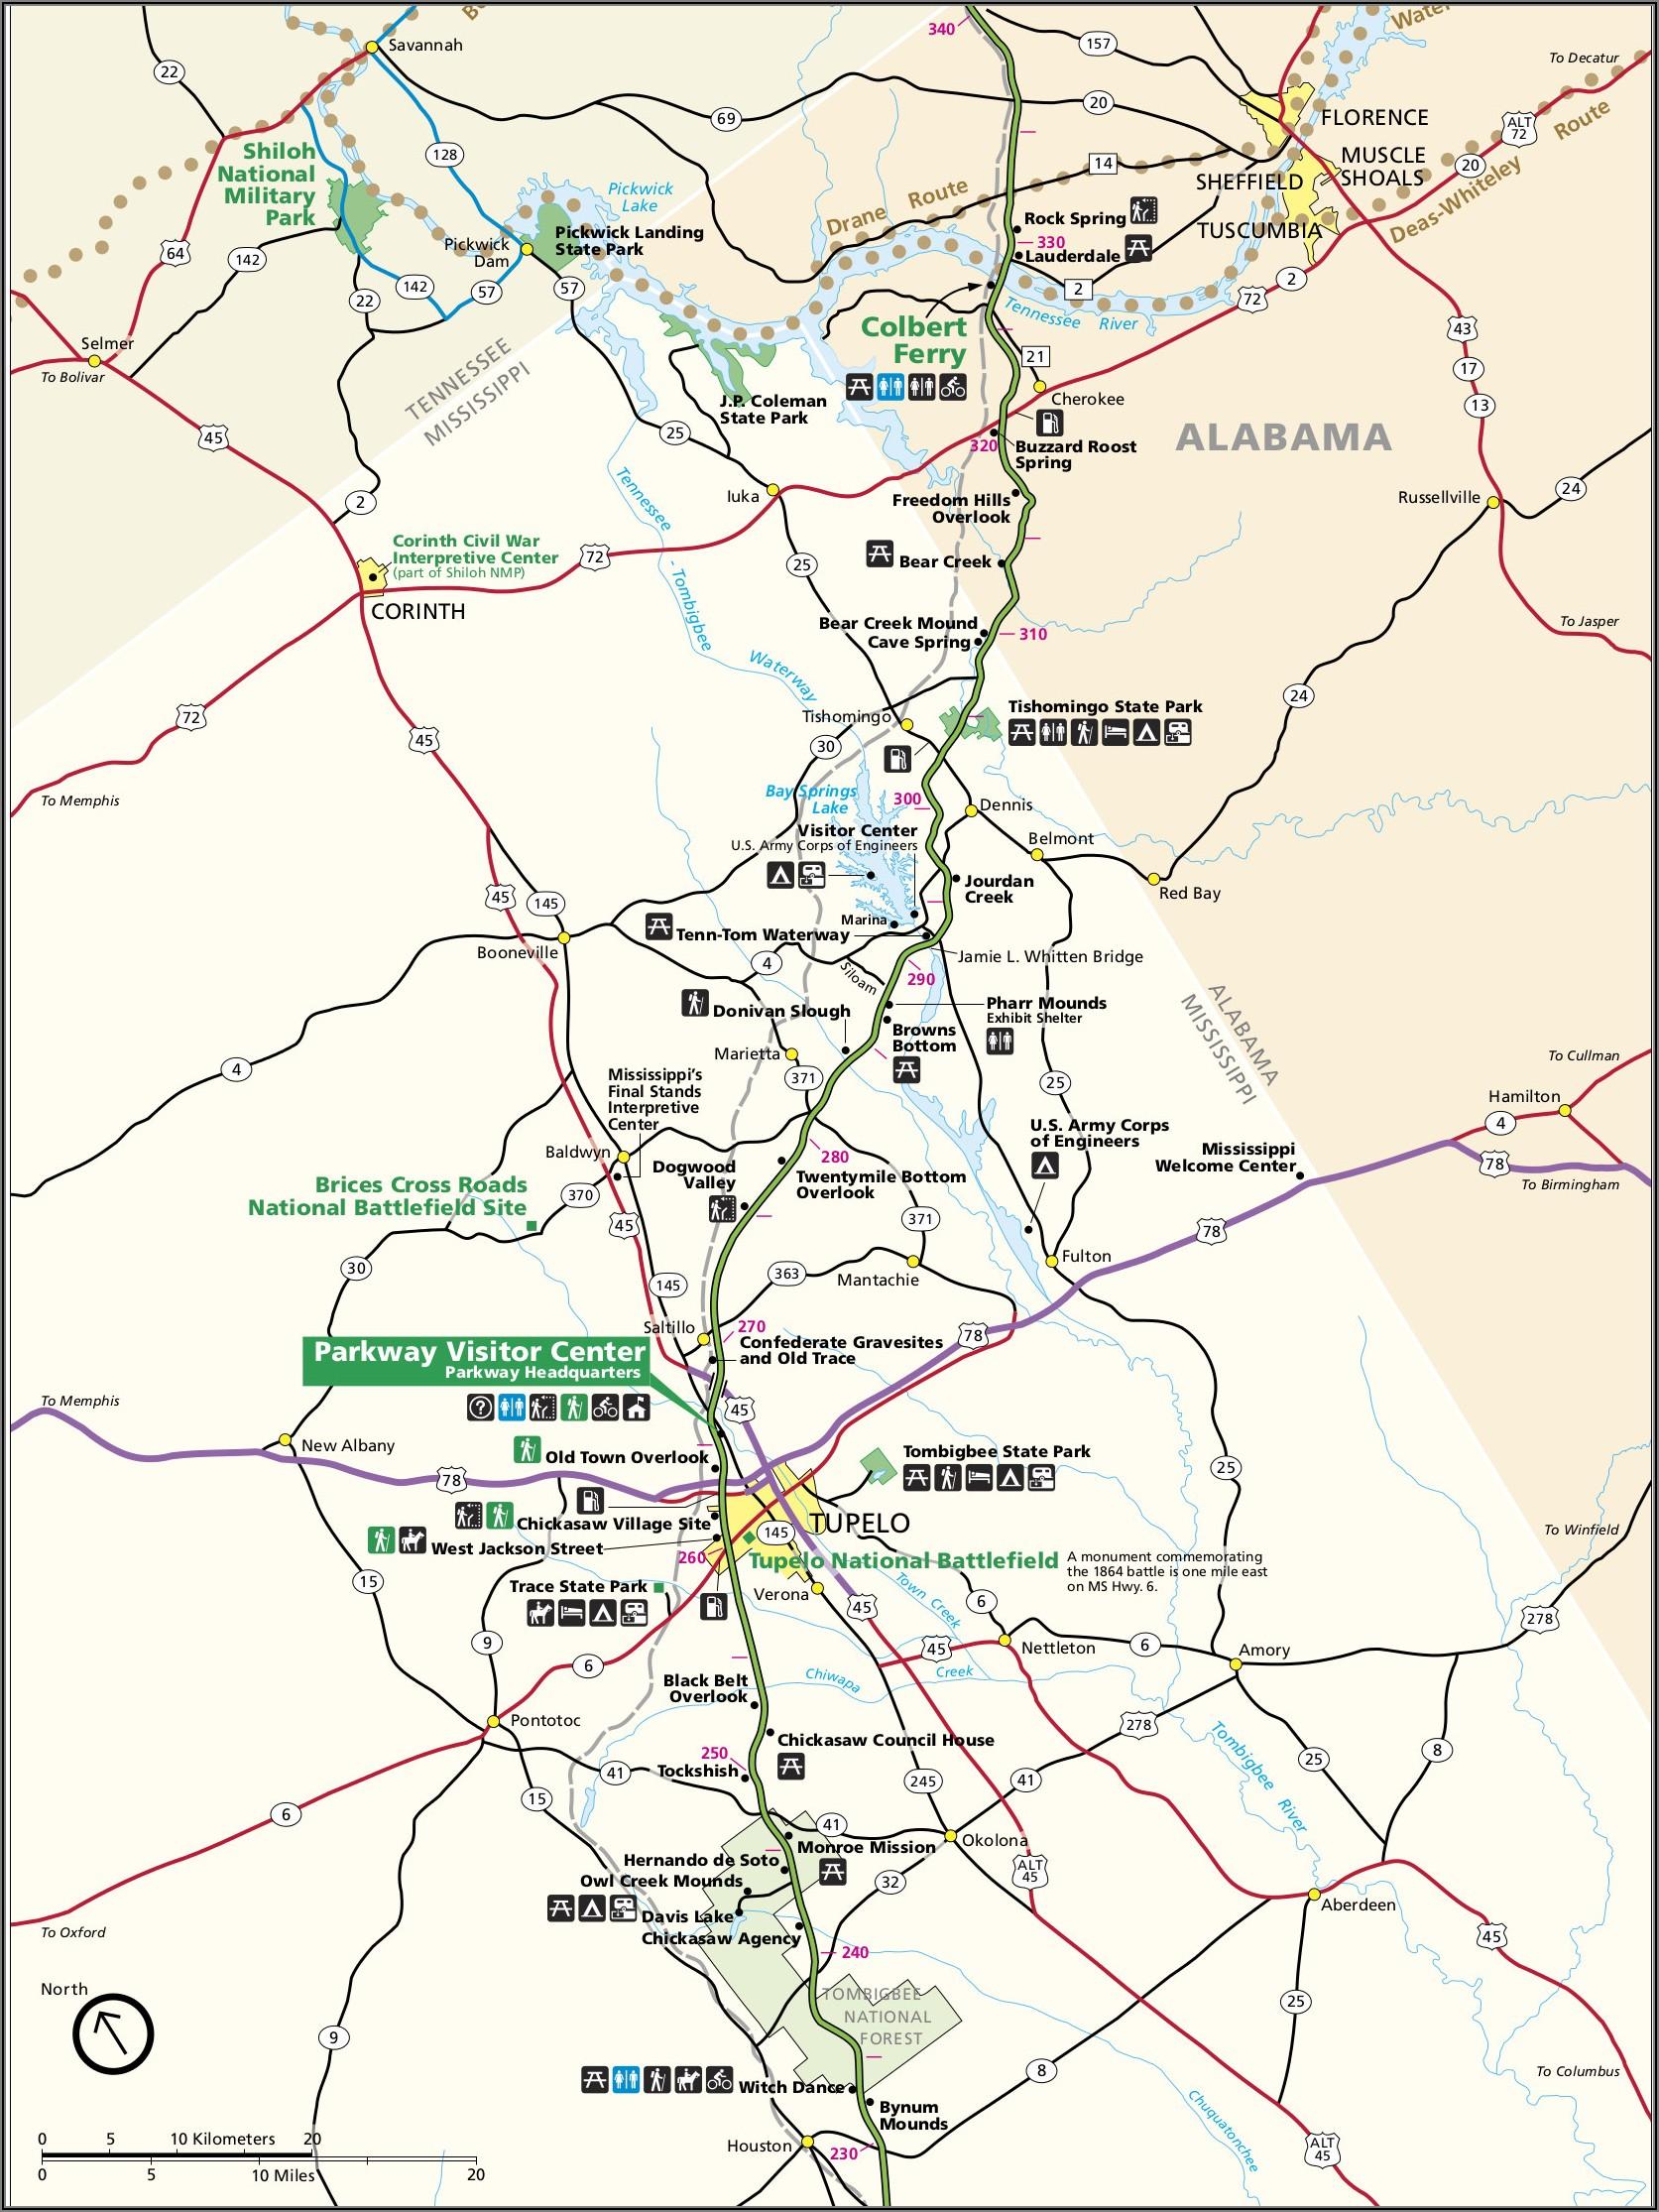 Natchez Trace Parkway Directions